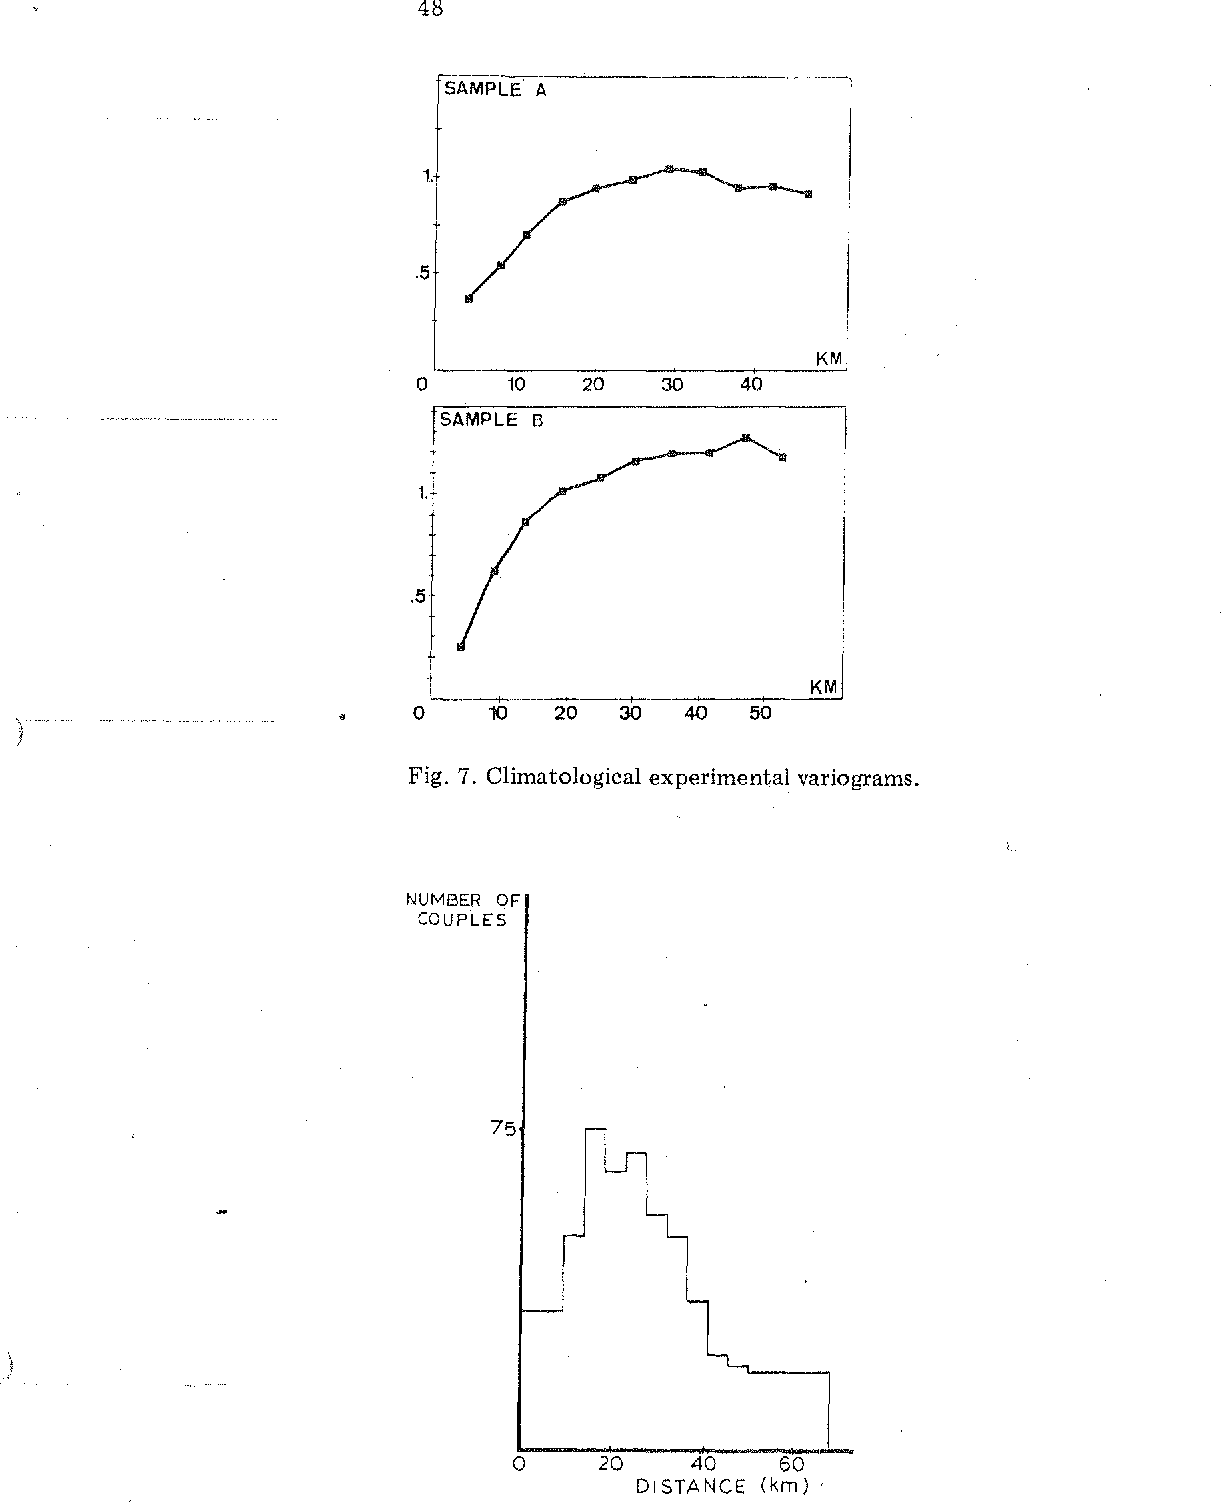 Fig. 7. Climatological experimental variograms.